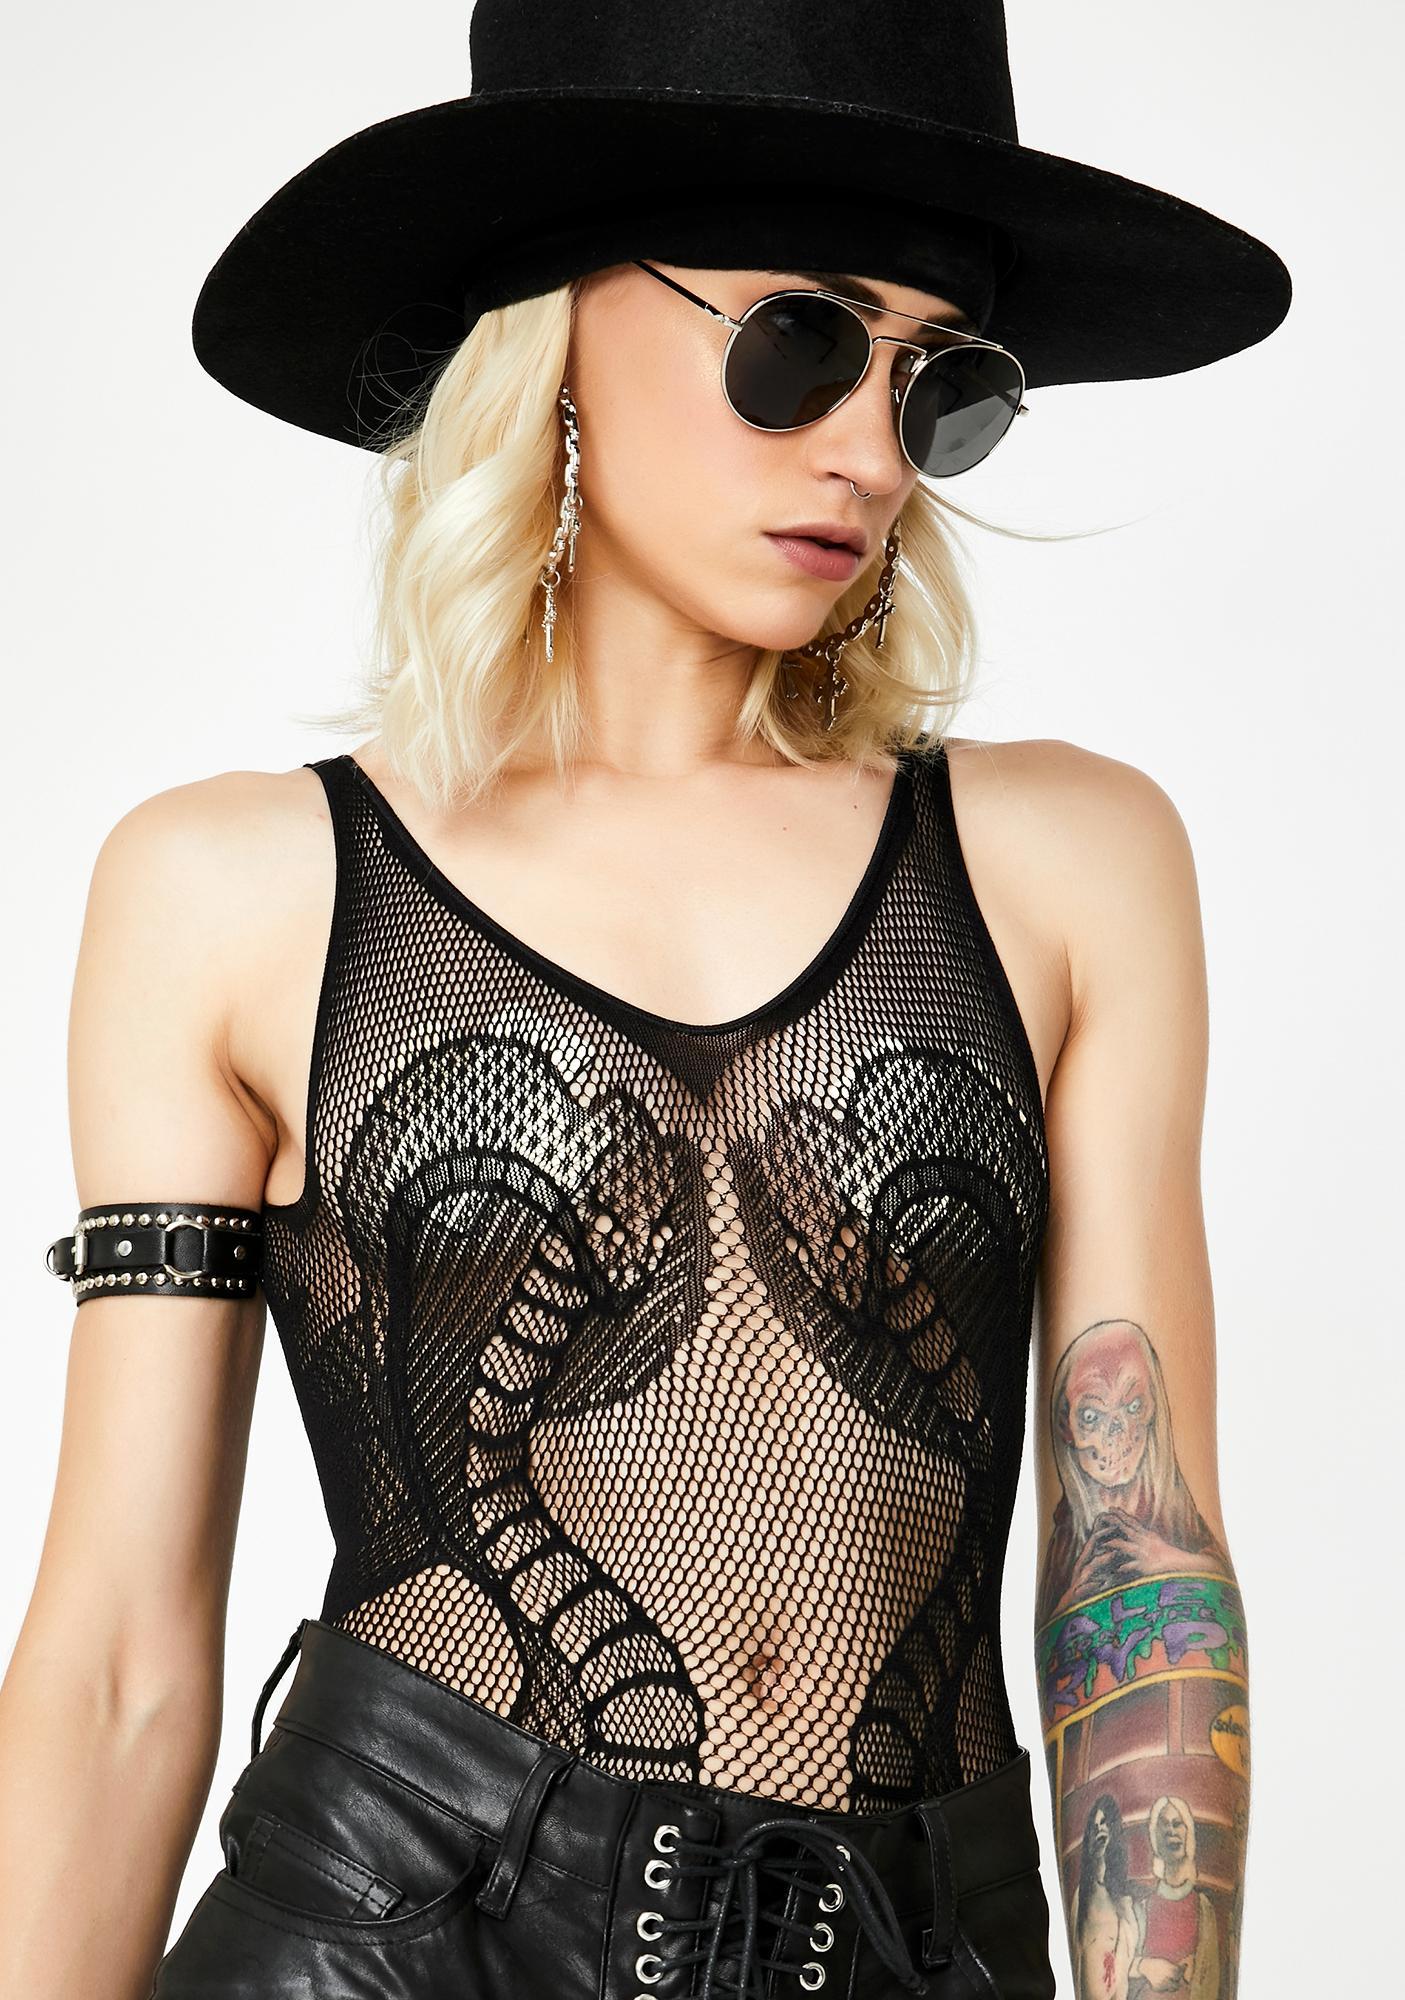 Anacondas Only Sheer Bodysuit